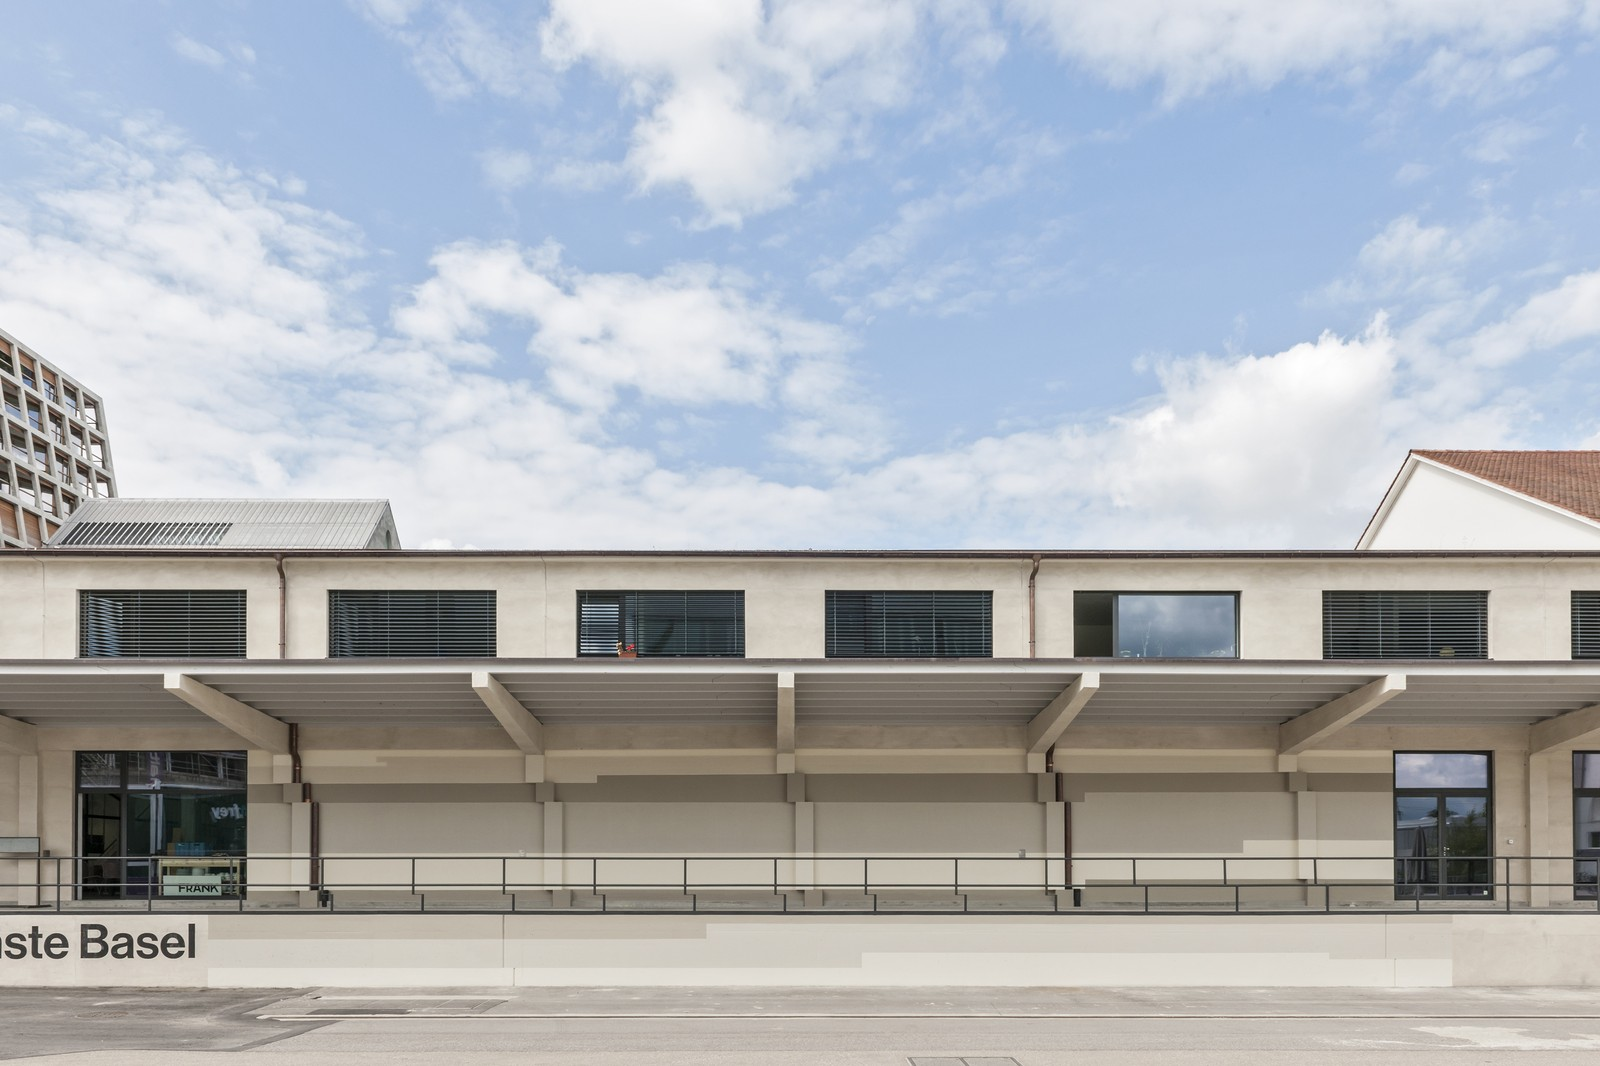 Un ejemplo de arquitectura glitch